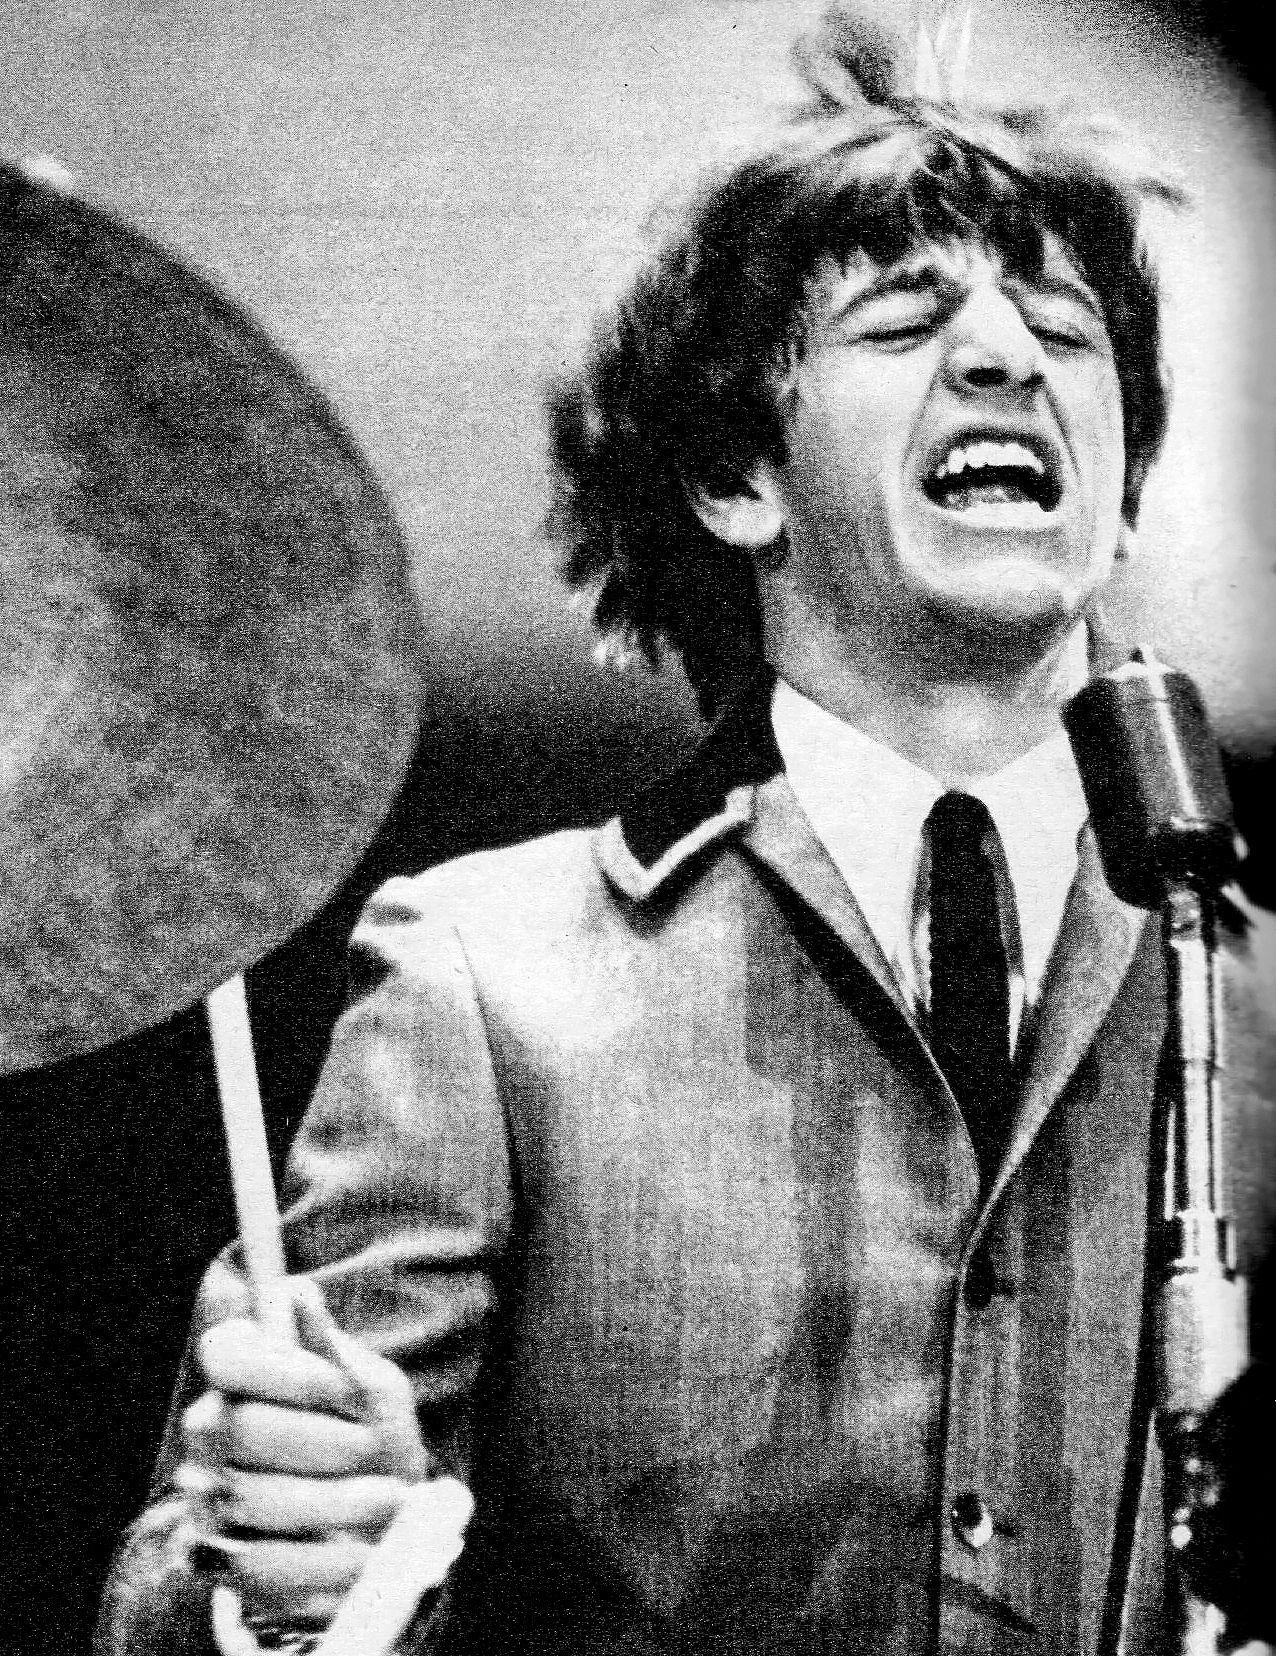 a54a7de8 My favorite Beatle. That's right, RINGO!   Rock & Roll   The beatles ...